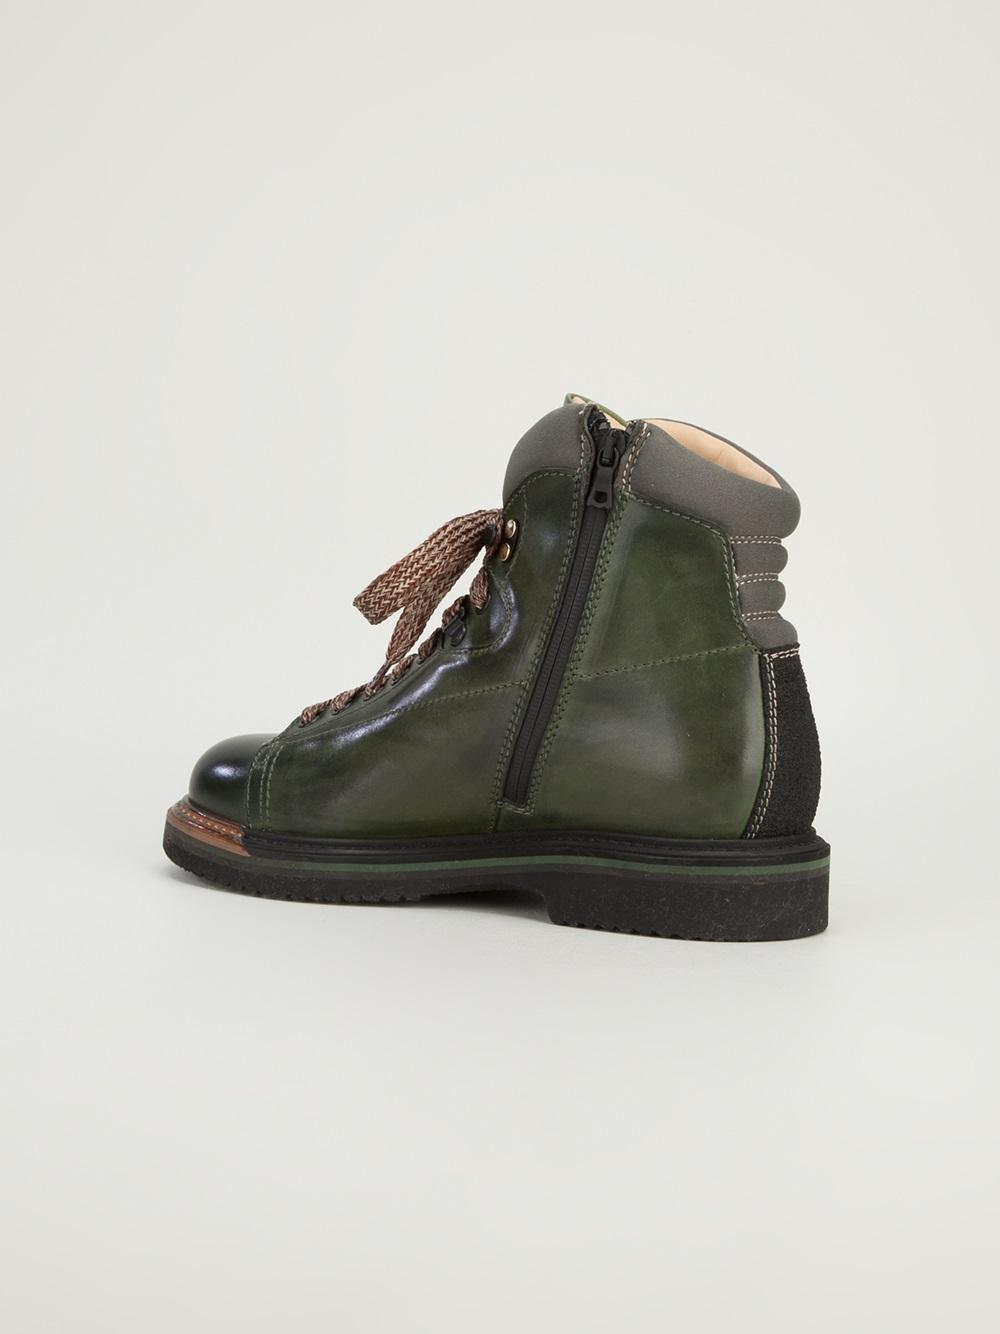 Santoni Monkey Boot hiking men's boots zipper 1